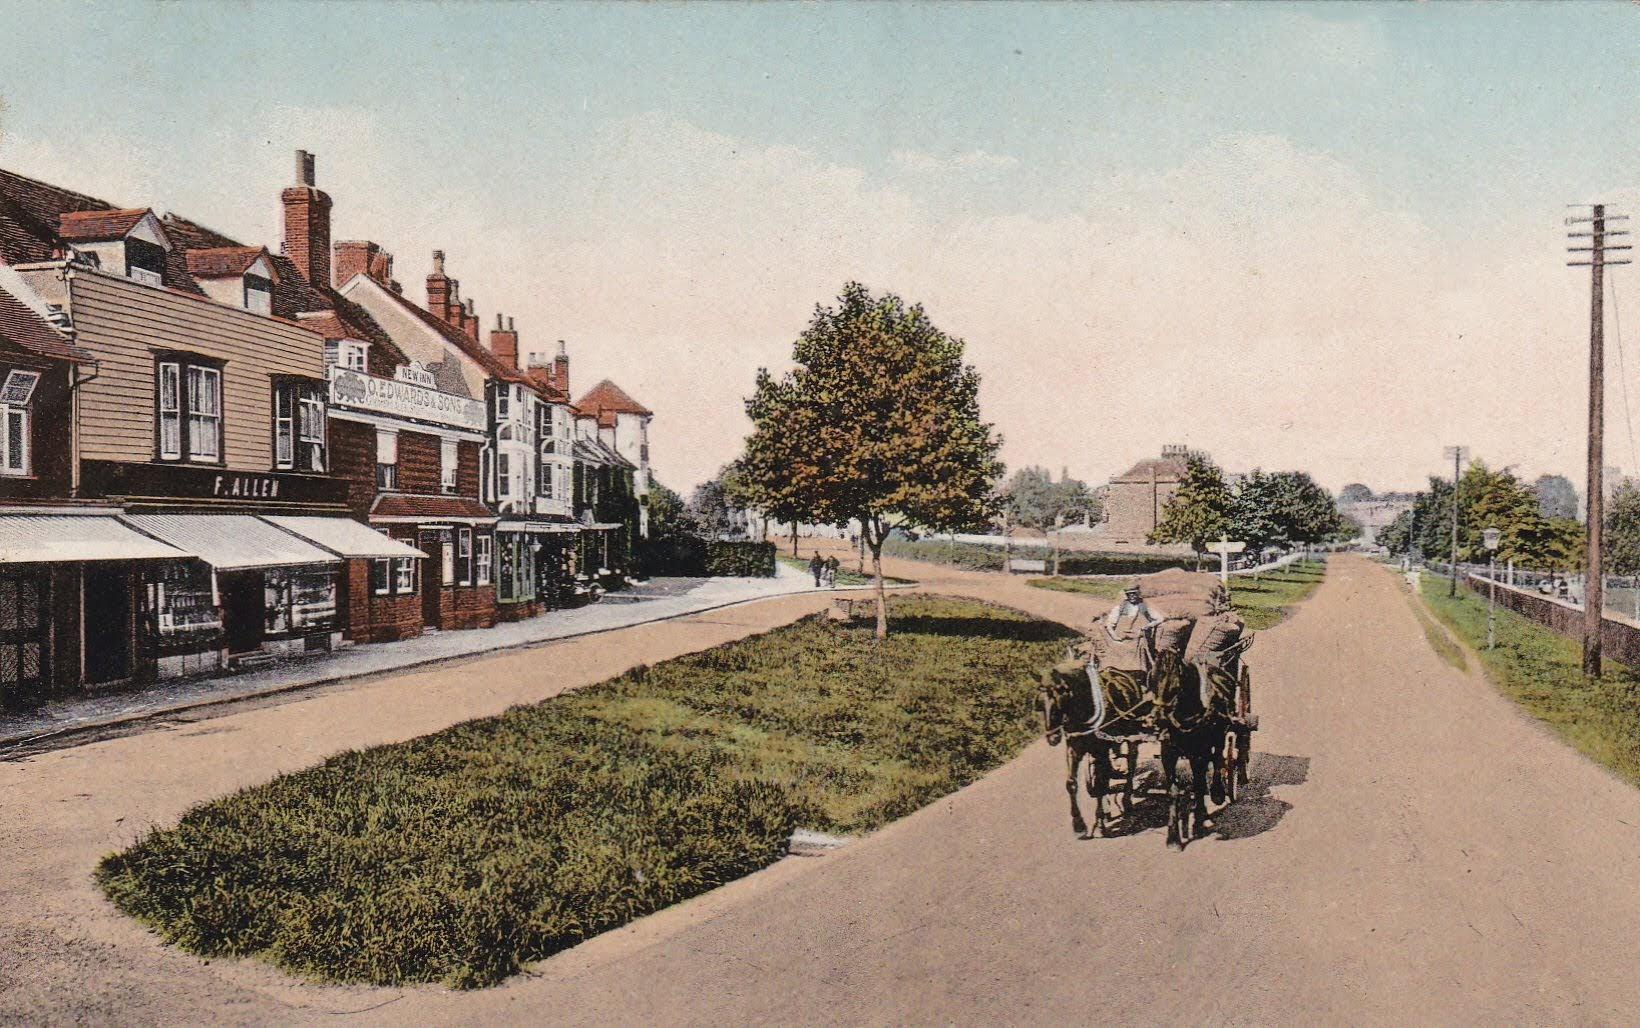 East Cross Tenterden in about 1900